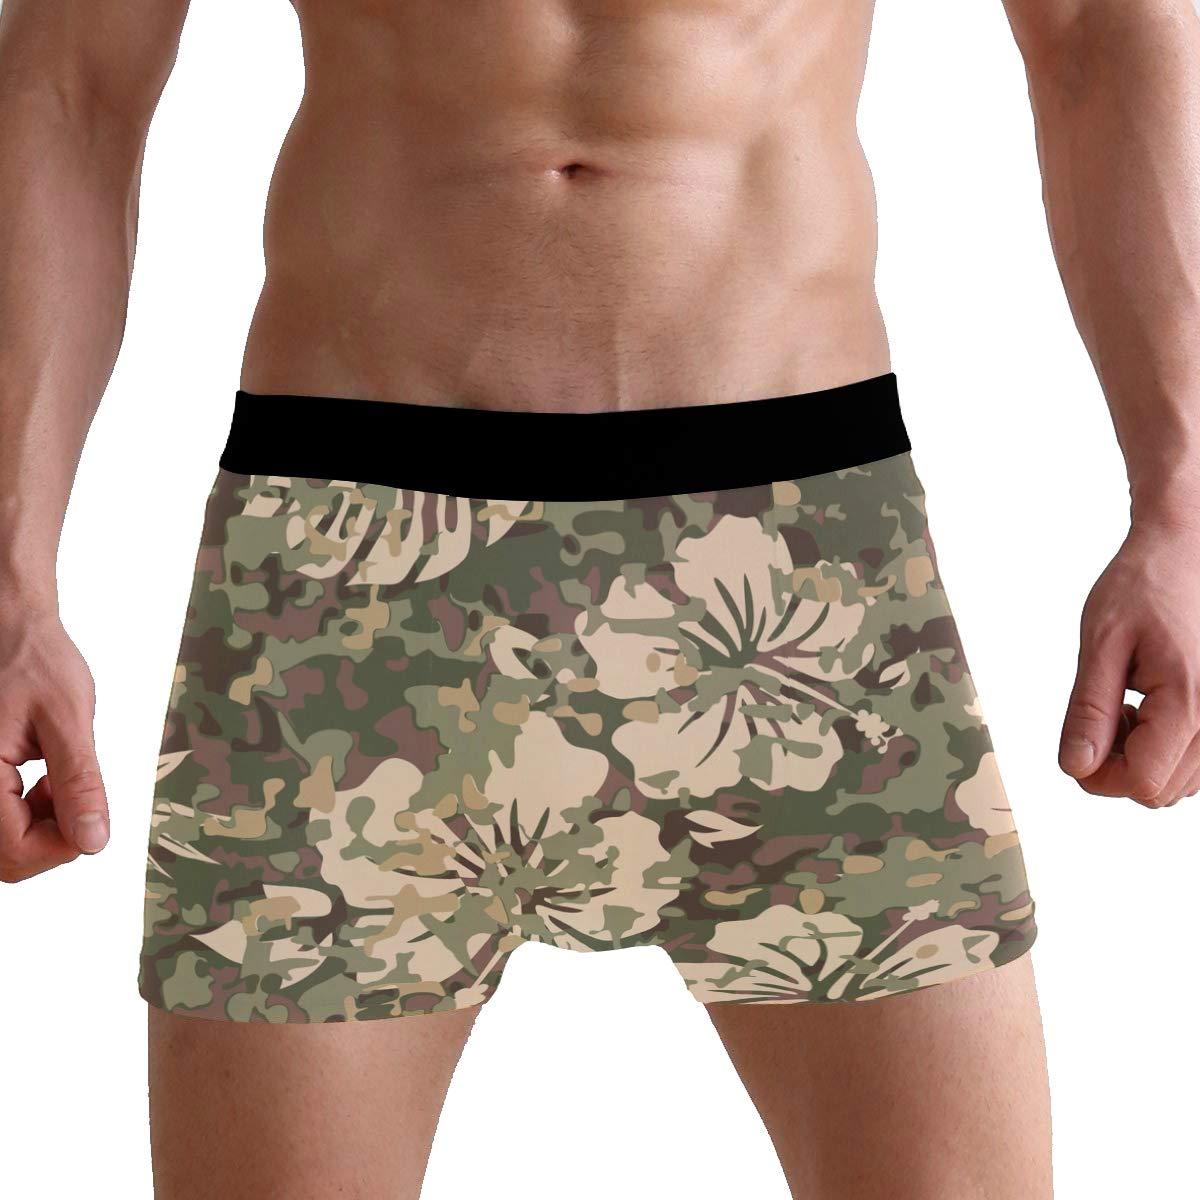 Camouflage Hibiscus Palm Leaf Mens Underwear Boxer Briefs Breathable Multi